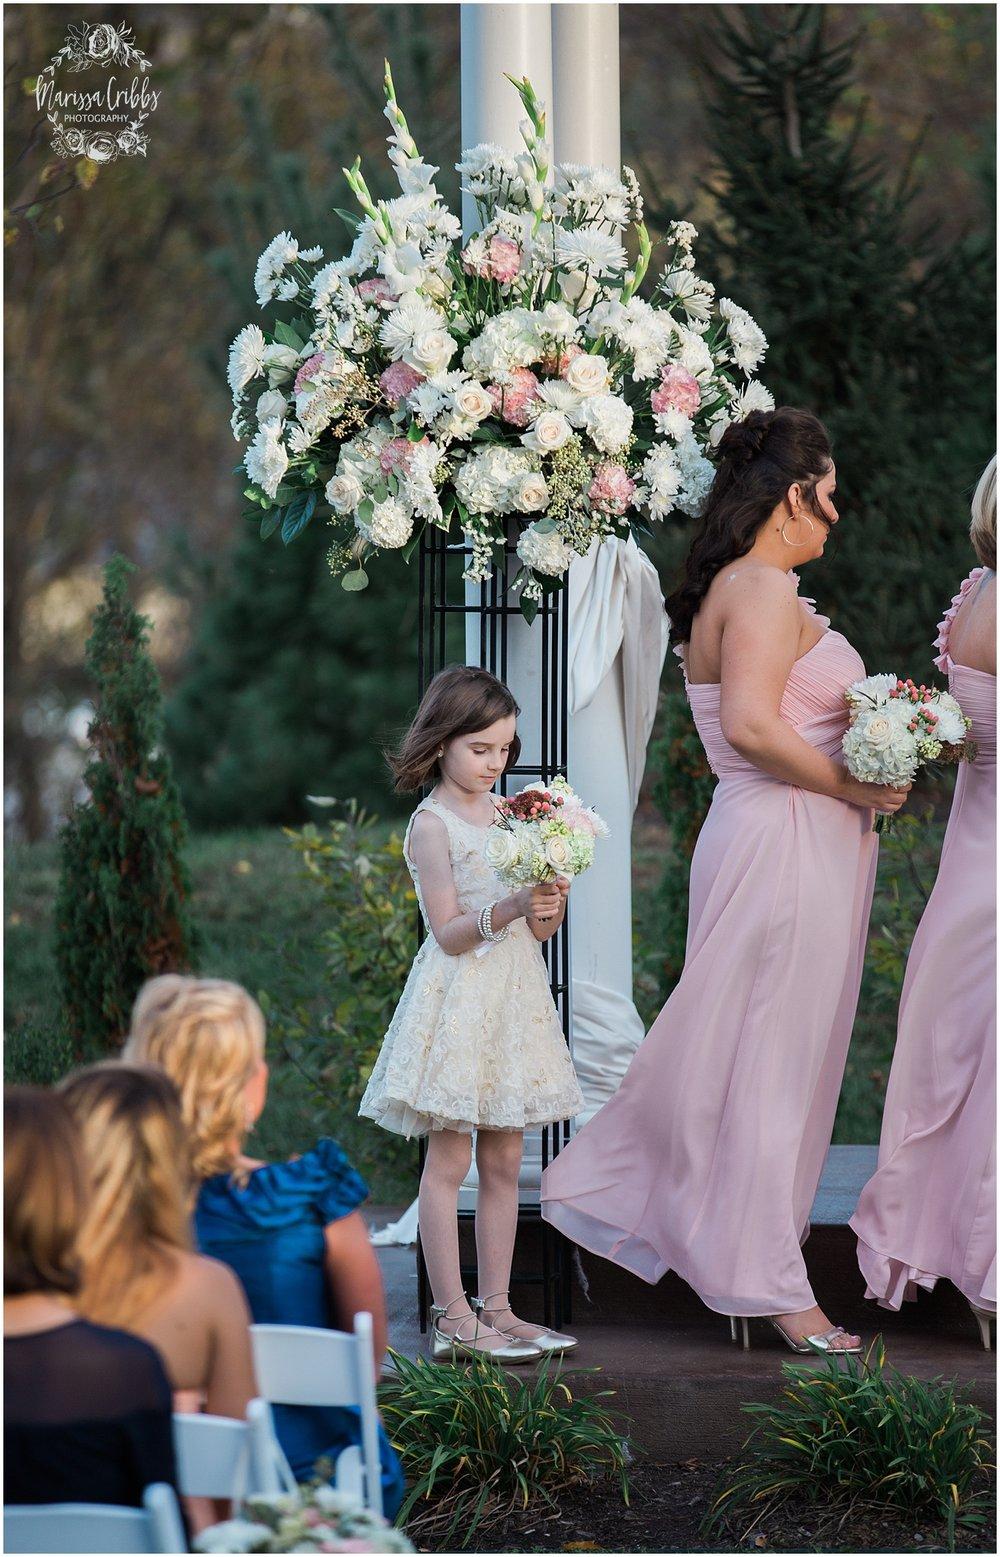 Alex+&+Amie+_+Eighteen+Ninety+Event+Space+_+Marissa+Cribbs+Photography+_+Kansas+City+Perfect+Wedding+Guide_1344.jpg